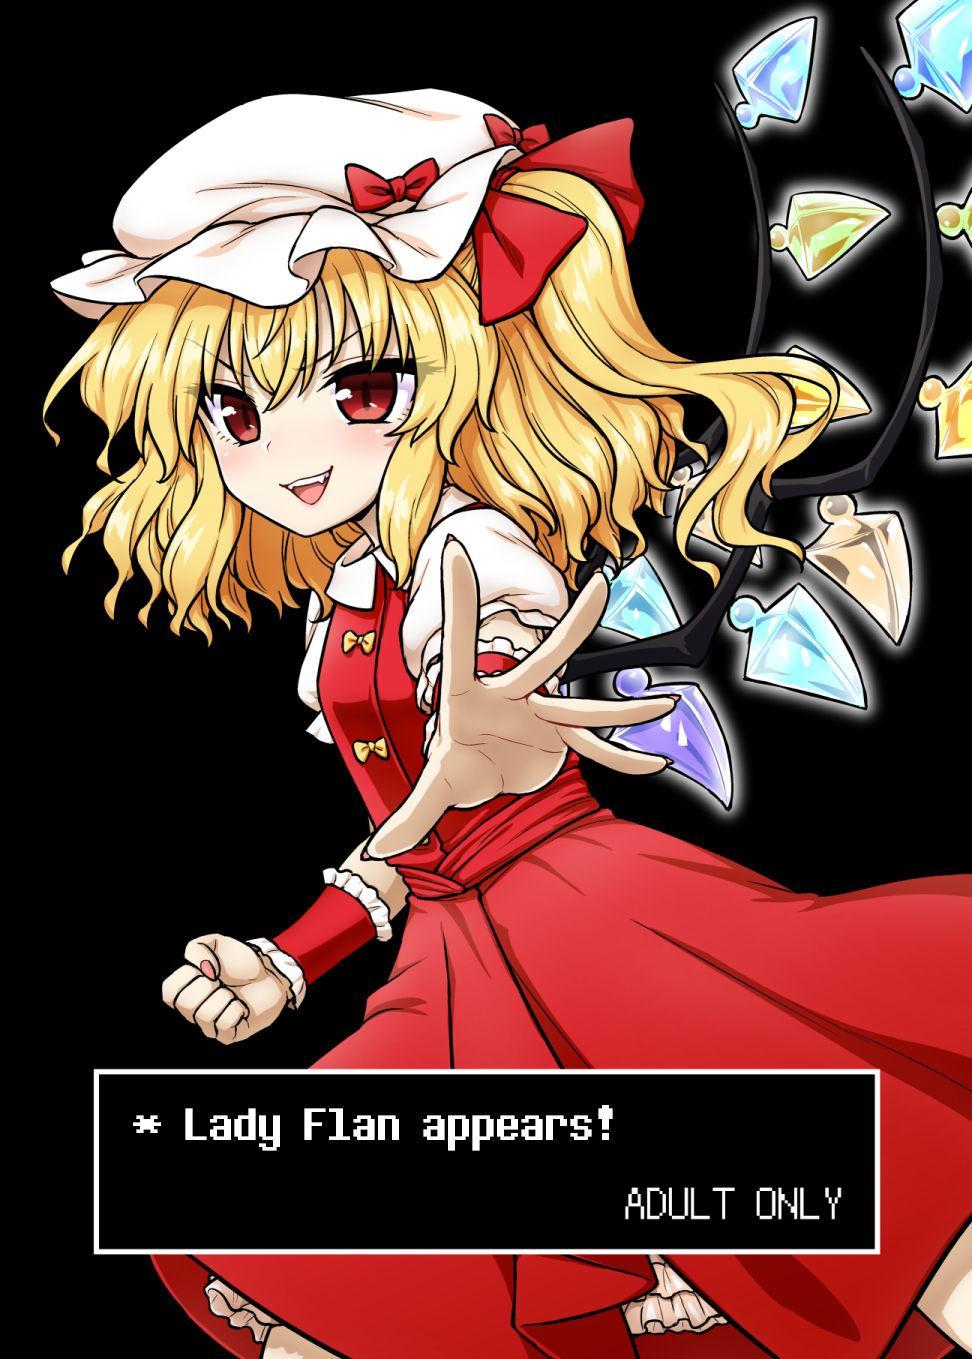 Flan-sama ga Arawareta! 0